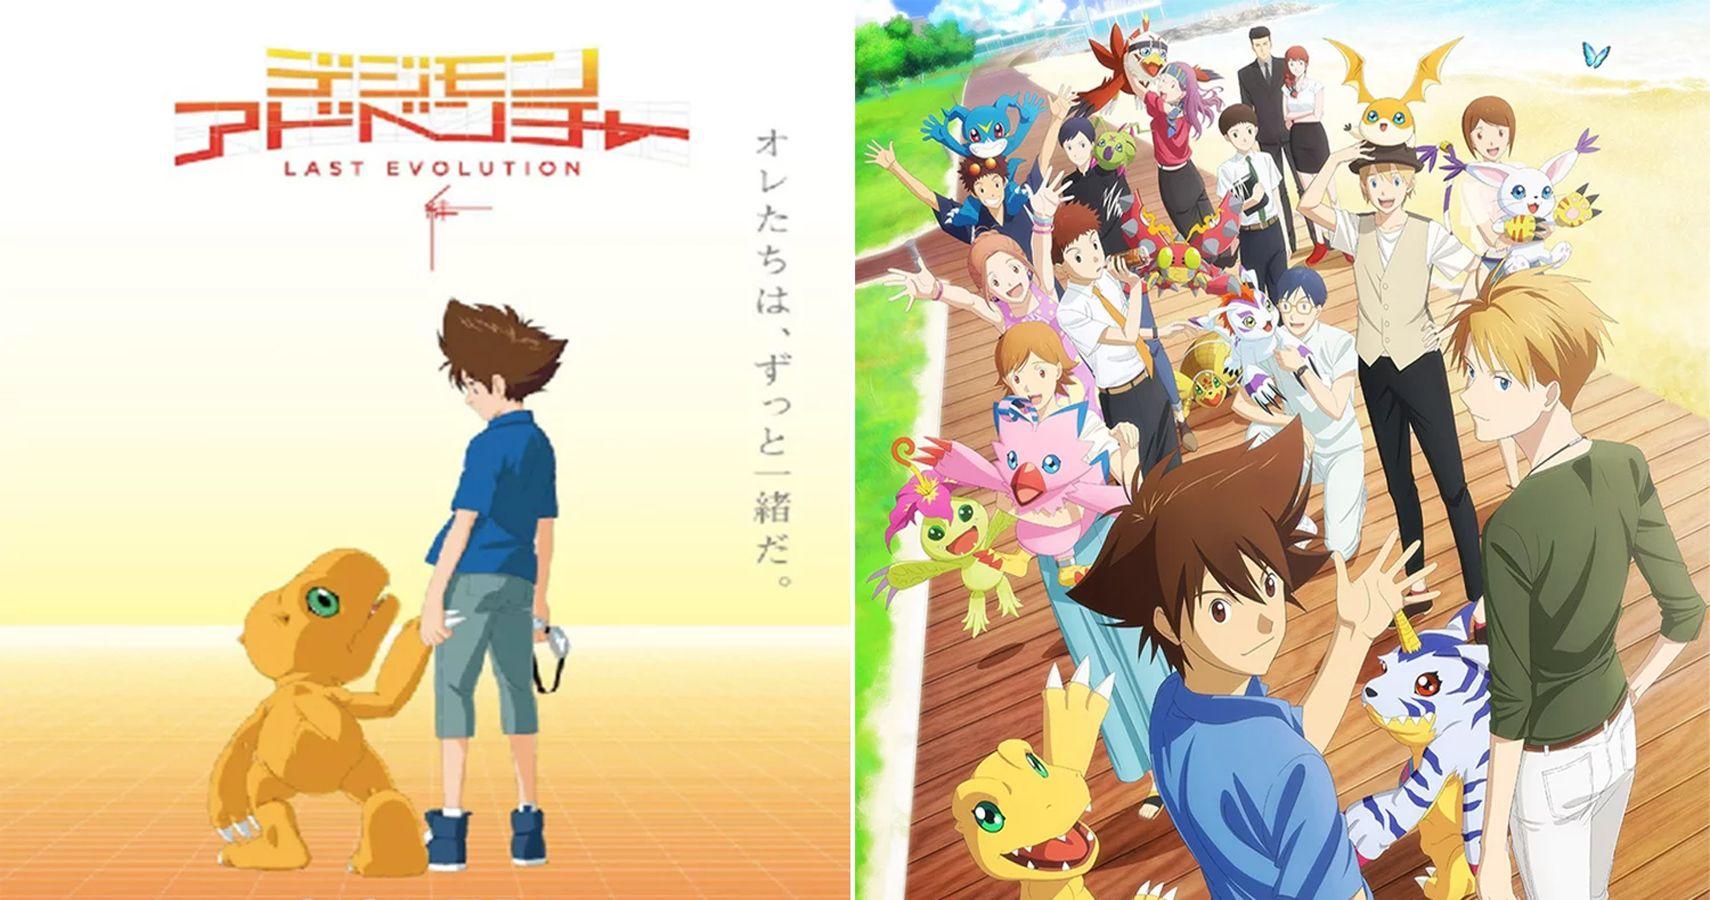 Digimon Adventure Kizuna Last Evolution Everything We Know So Far